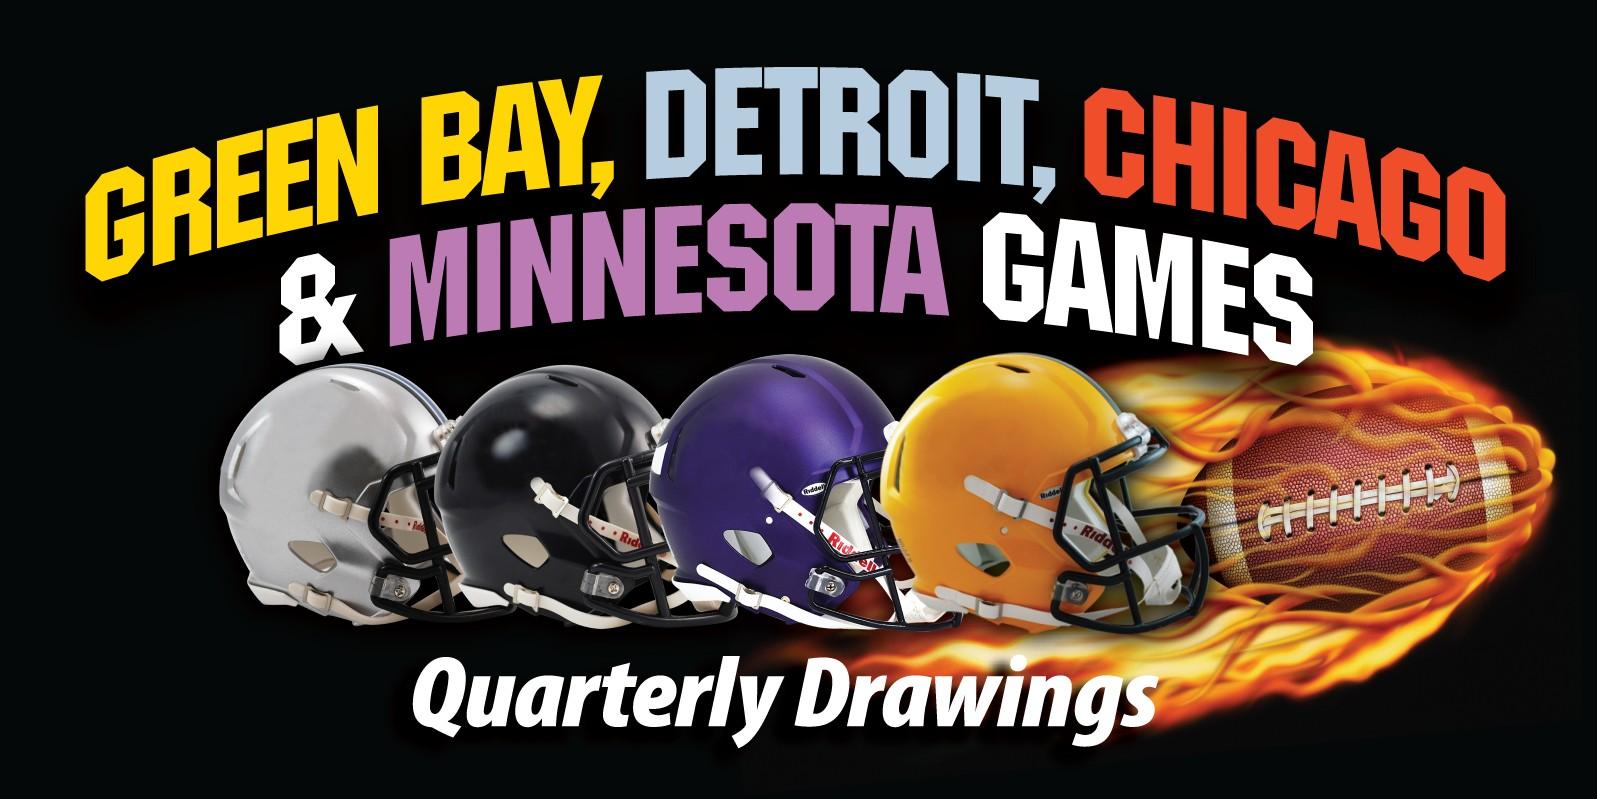 GB, Chicago, Detroit & MN Games Web Image